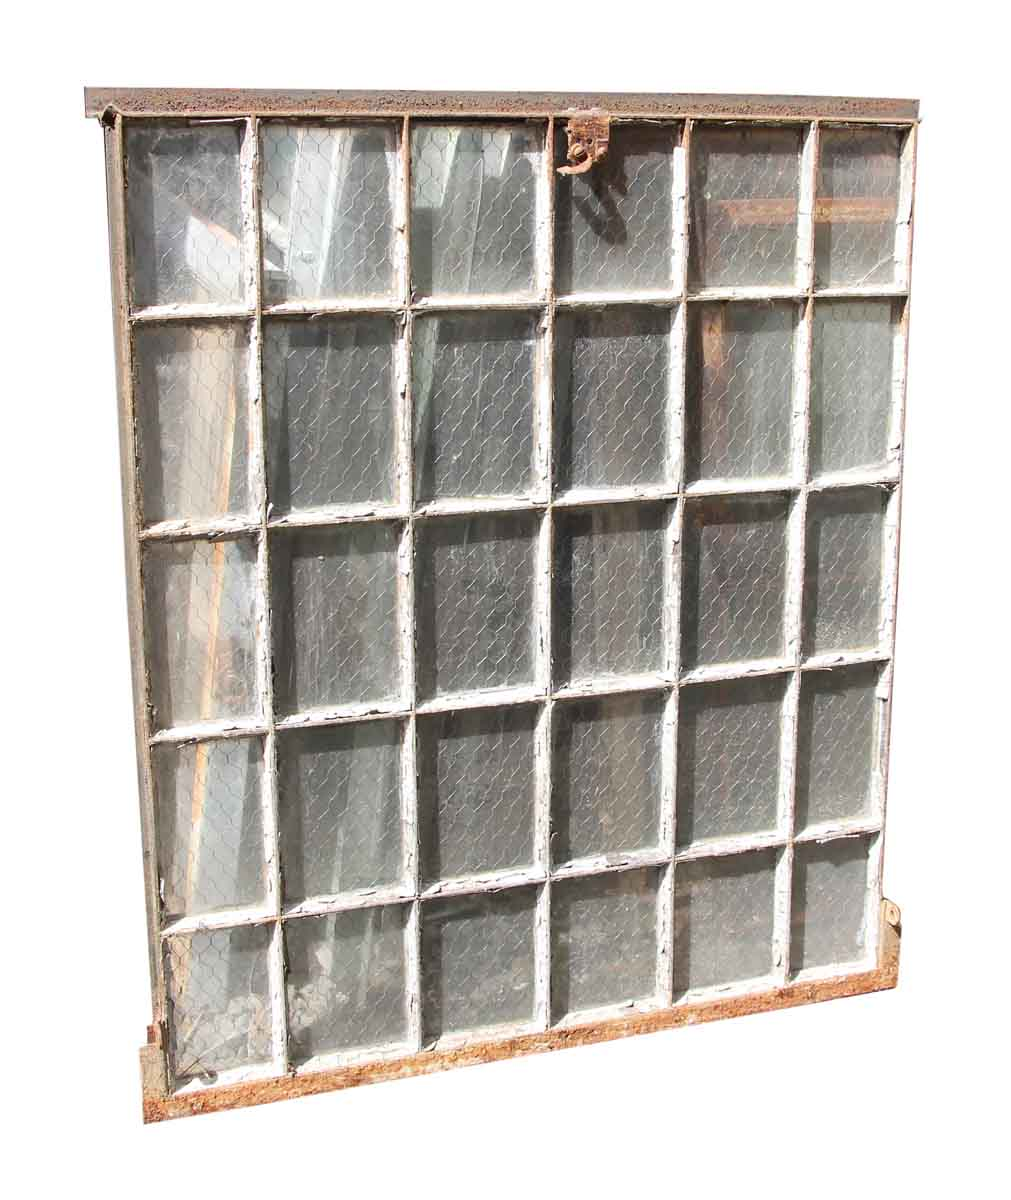 30 Pane Steel Frame Chicken Wire Glass Window | Olde Good Things